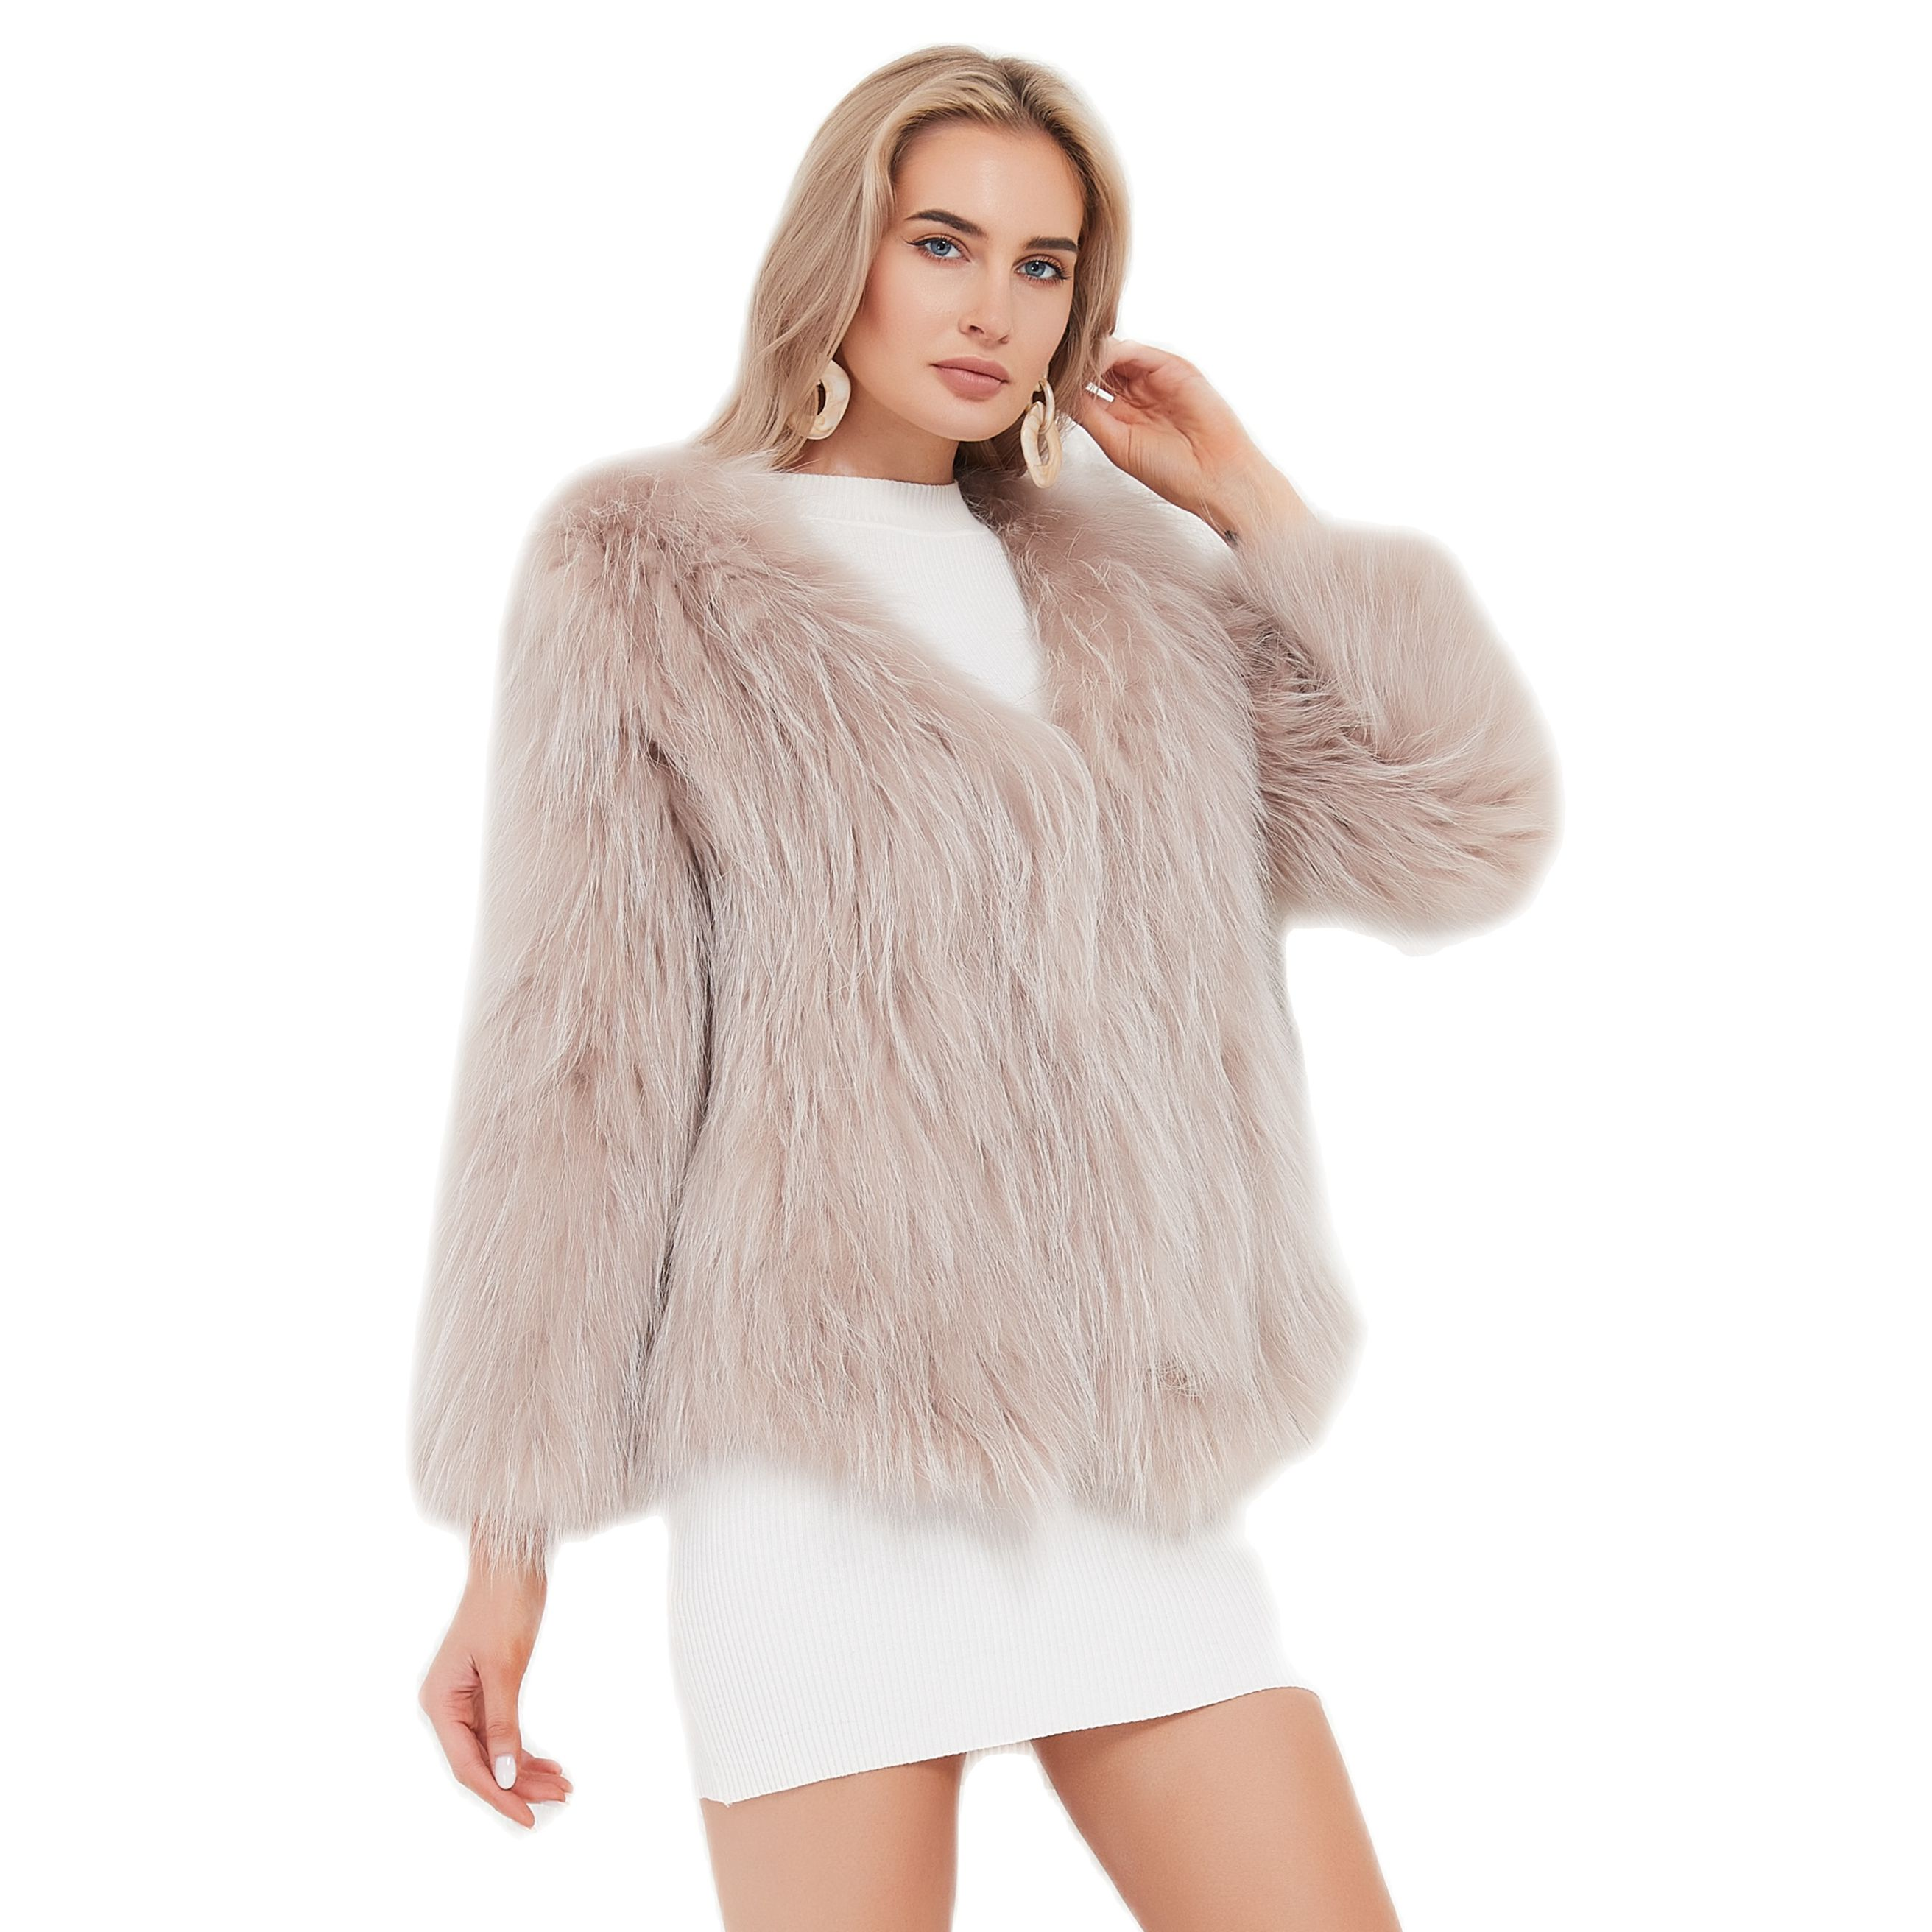 Pudi المرأة ريال الراكون الفراء متماسكة معطف العلامة التجارية الجديدة الفتاة الشتاء الدافئة معاطف جاكيتات سترة حجم كبير أسود وردي CT122